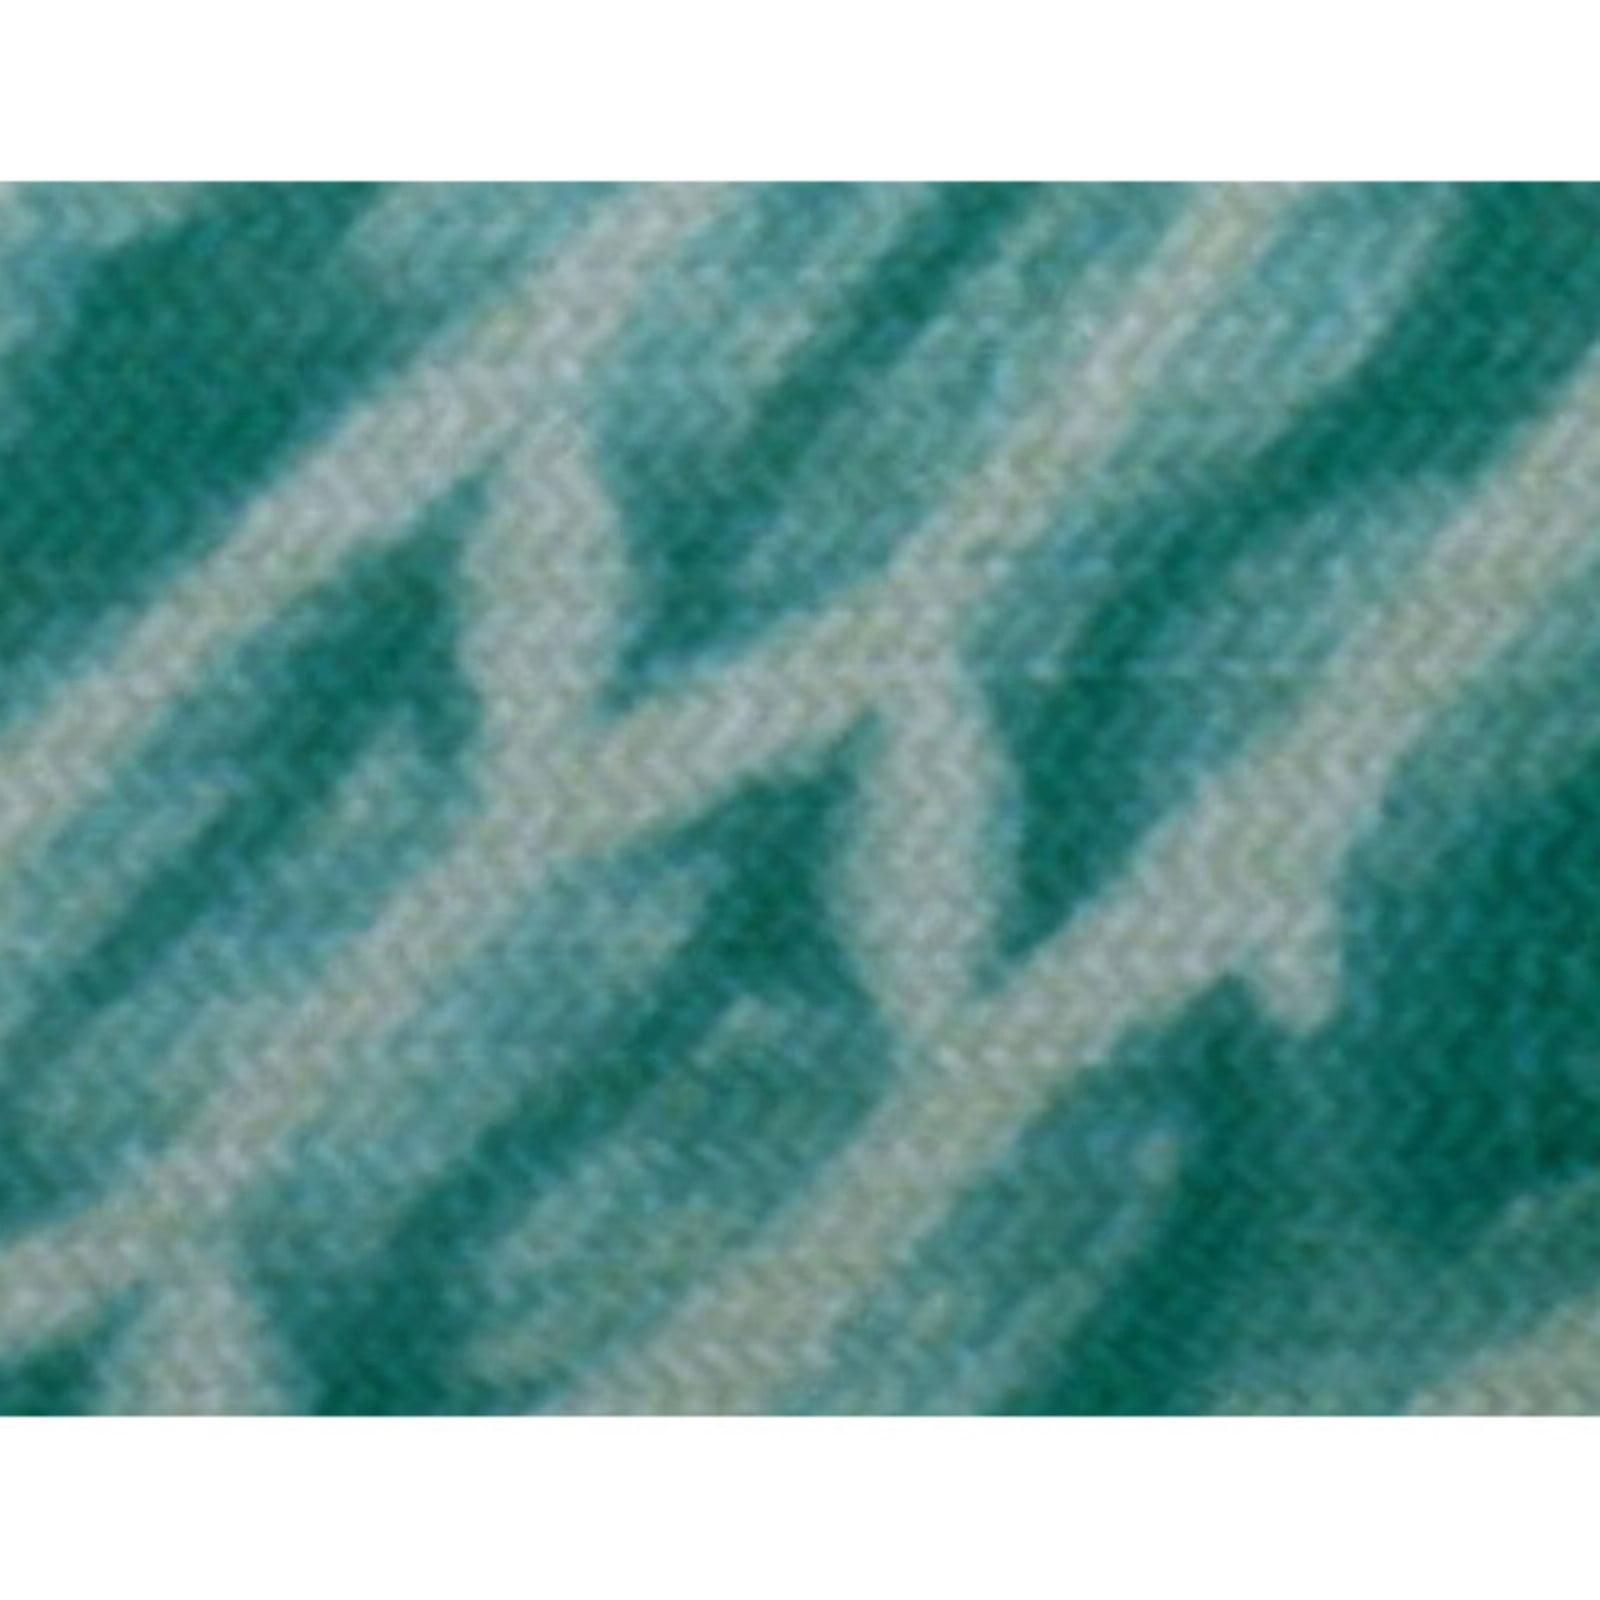 Coral E by design RGN421OR15-23 Shibori Stripe Geometric Print Indoor//Outdoor Rug 2 x 3